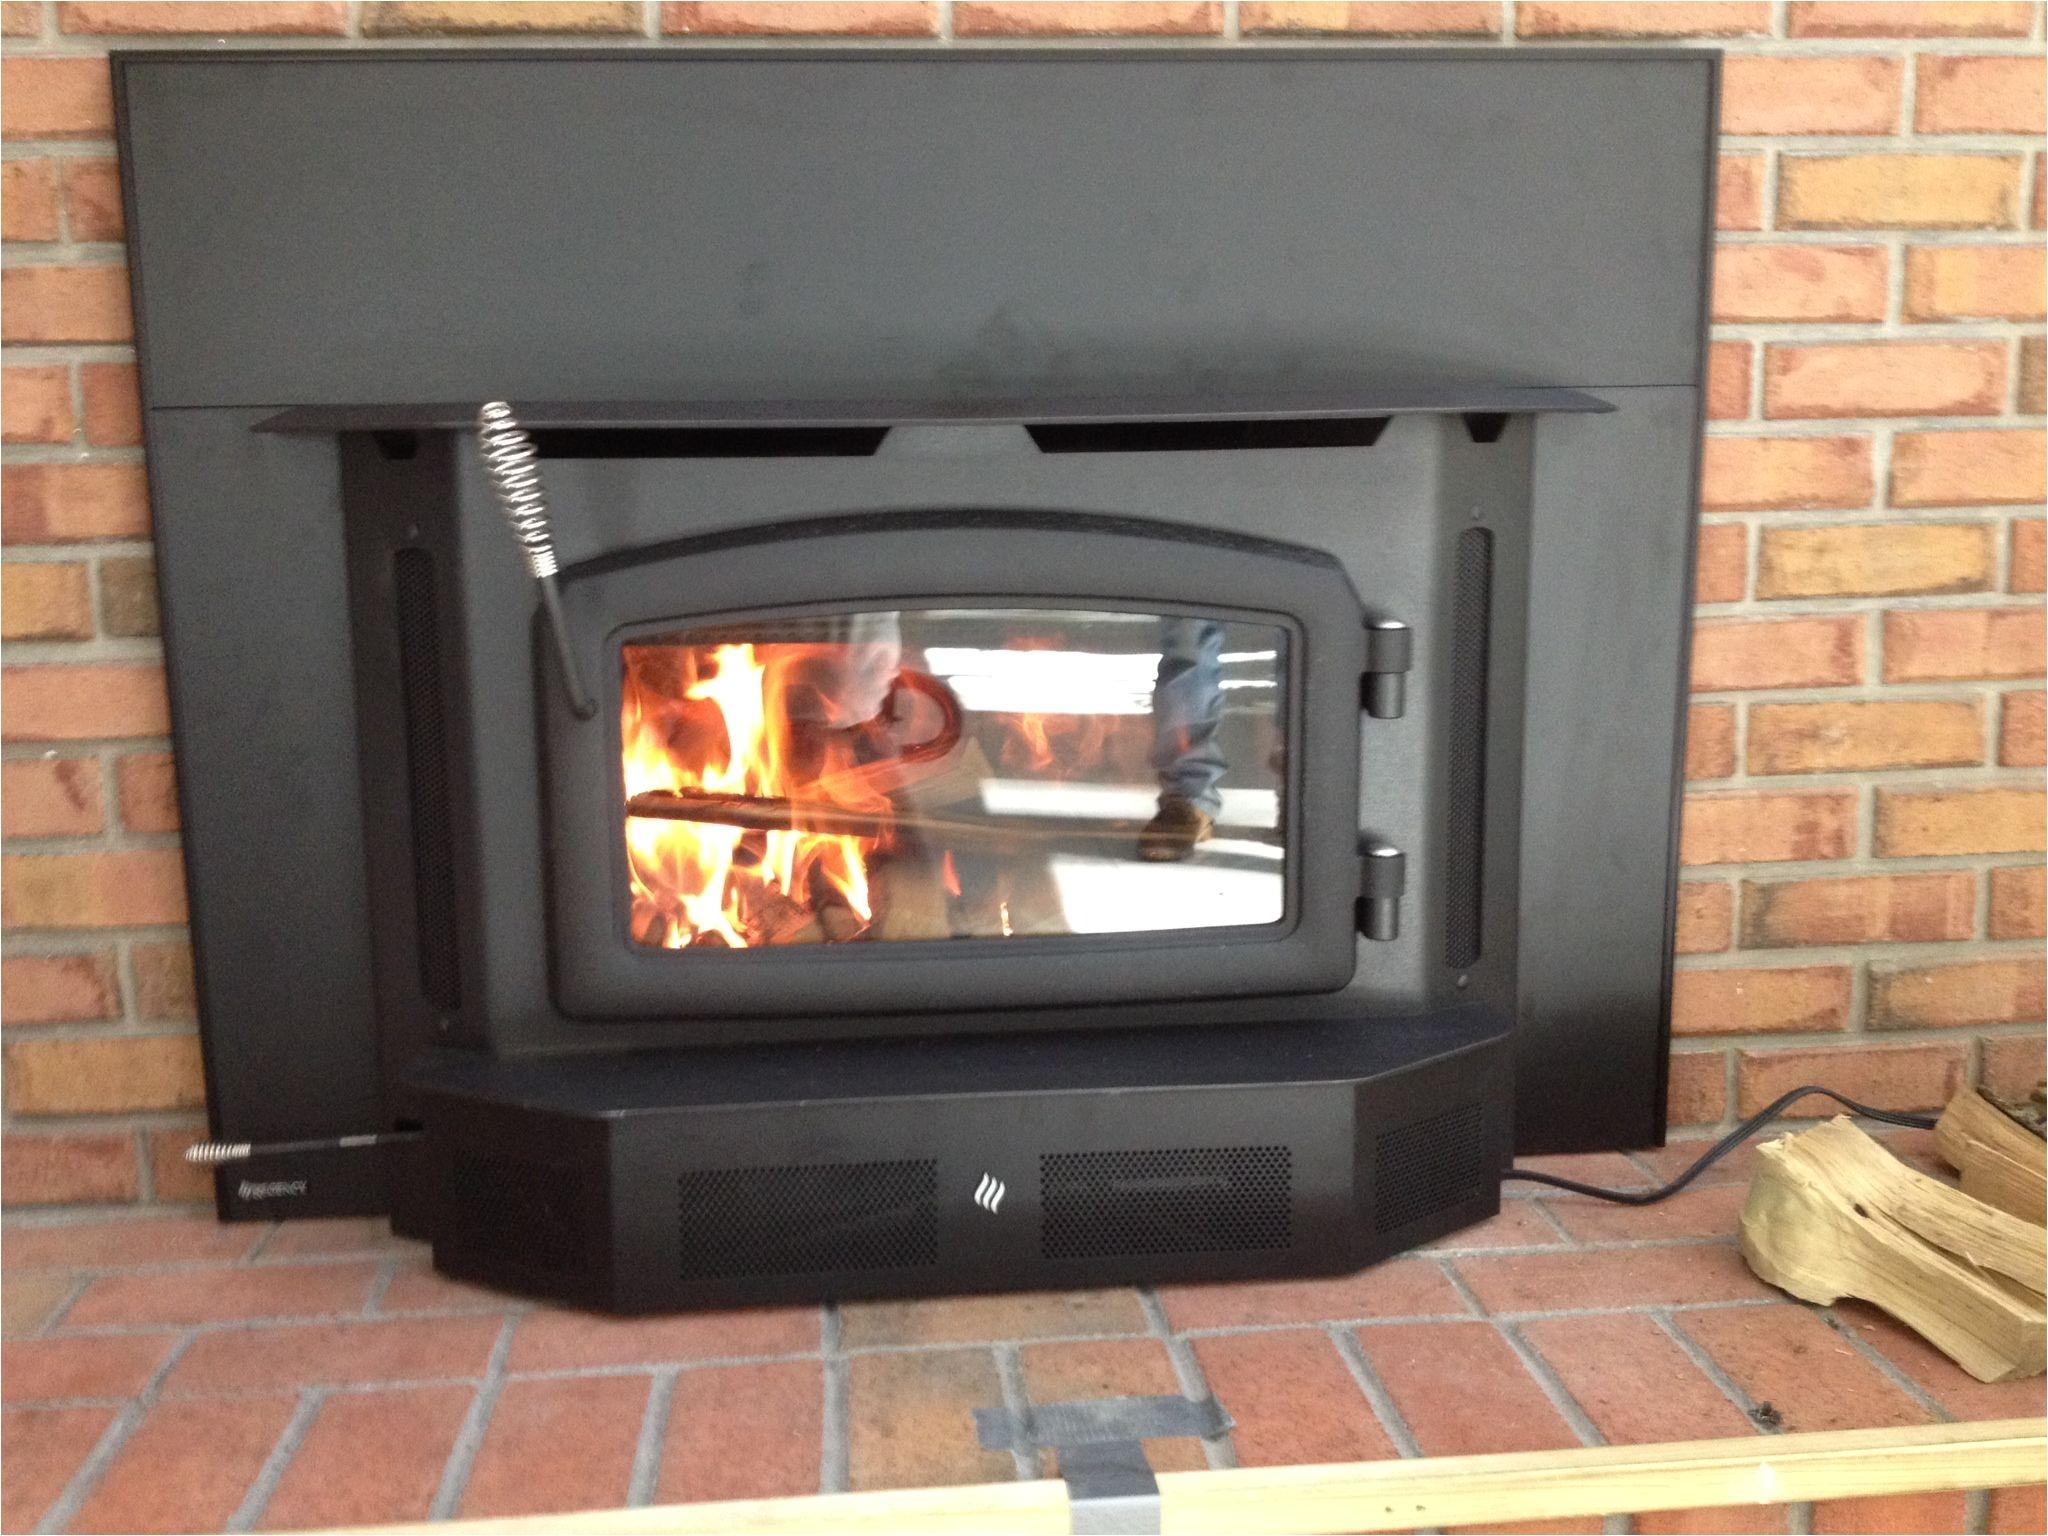 Wood Burning Fireplace Inserts Denver I3100 Wood Insert Woodinsert I3100 A1poolsandspas A1poolsct